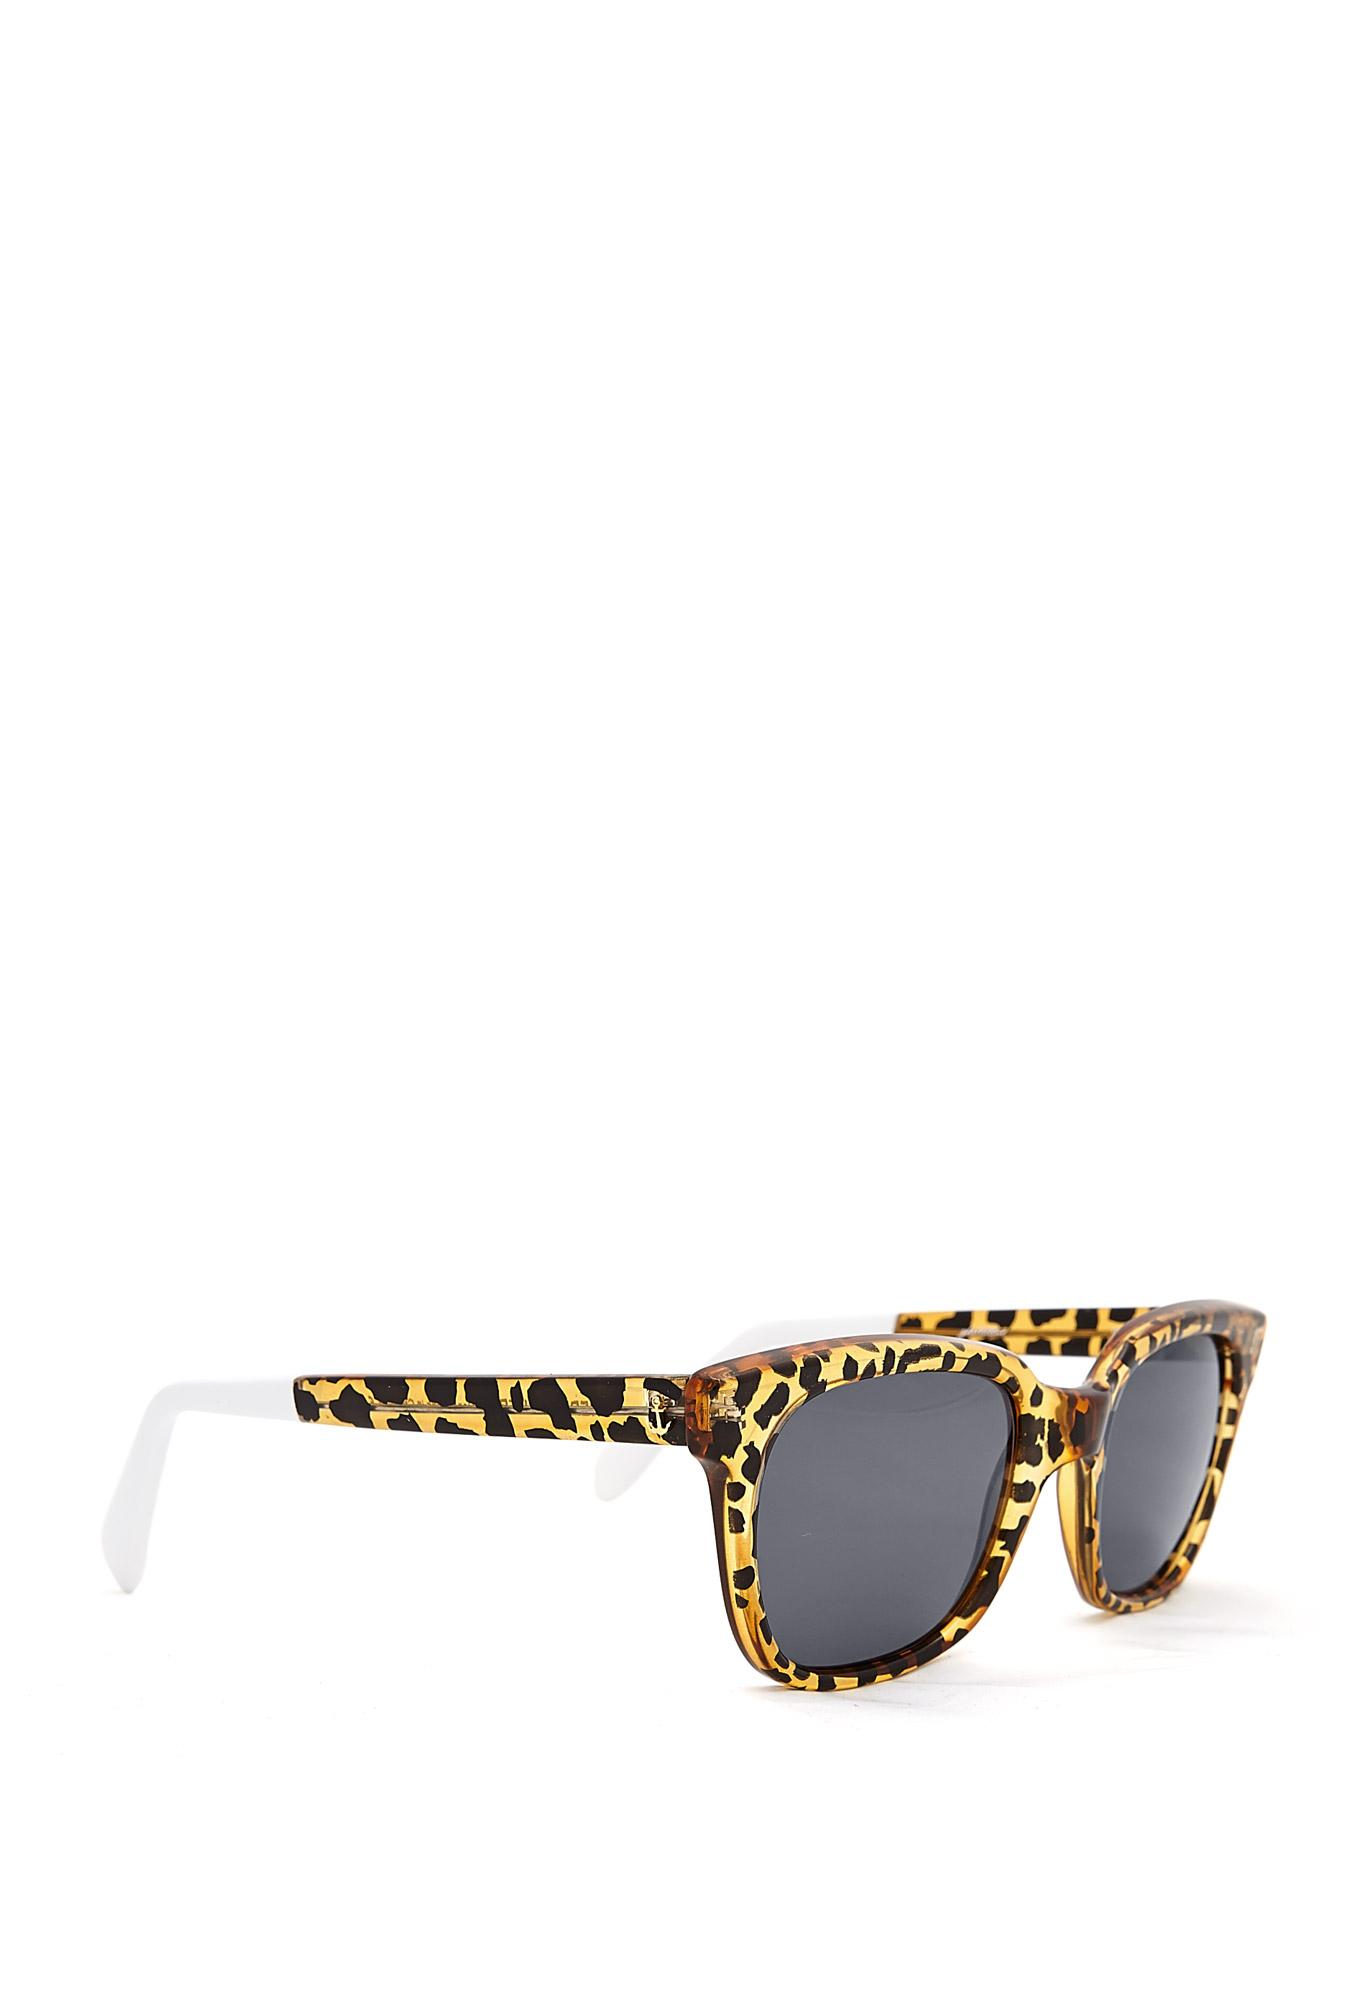 Sheriff & Cherry | Honey Wild Cat Leopard Plastic Sunglasses by Sheriff & Cherr